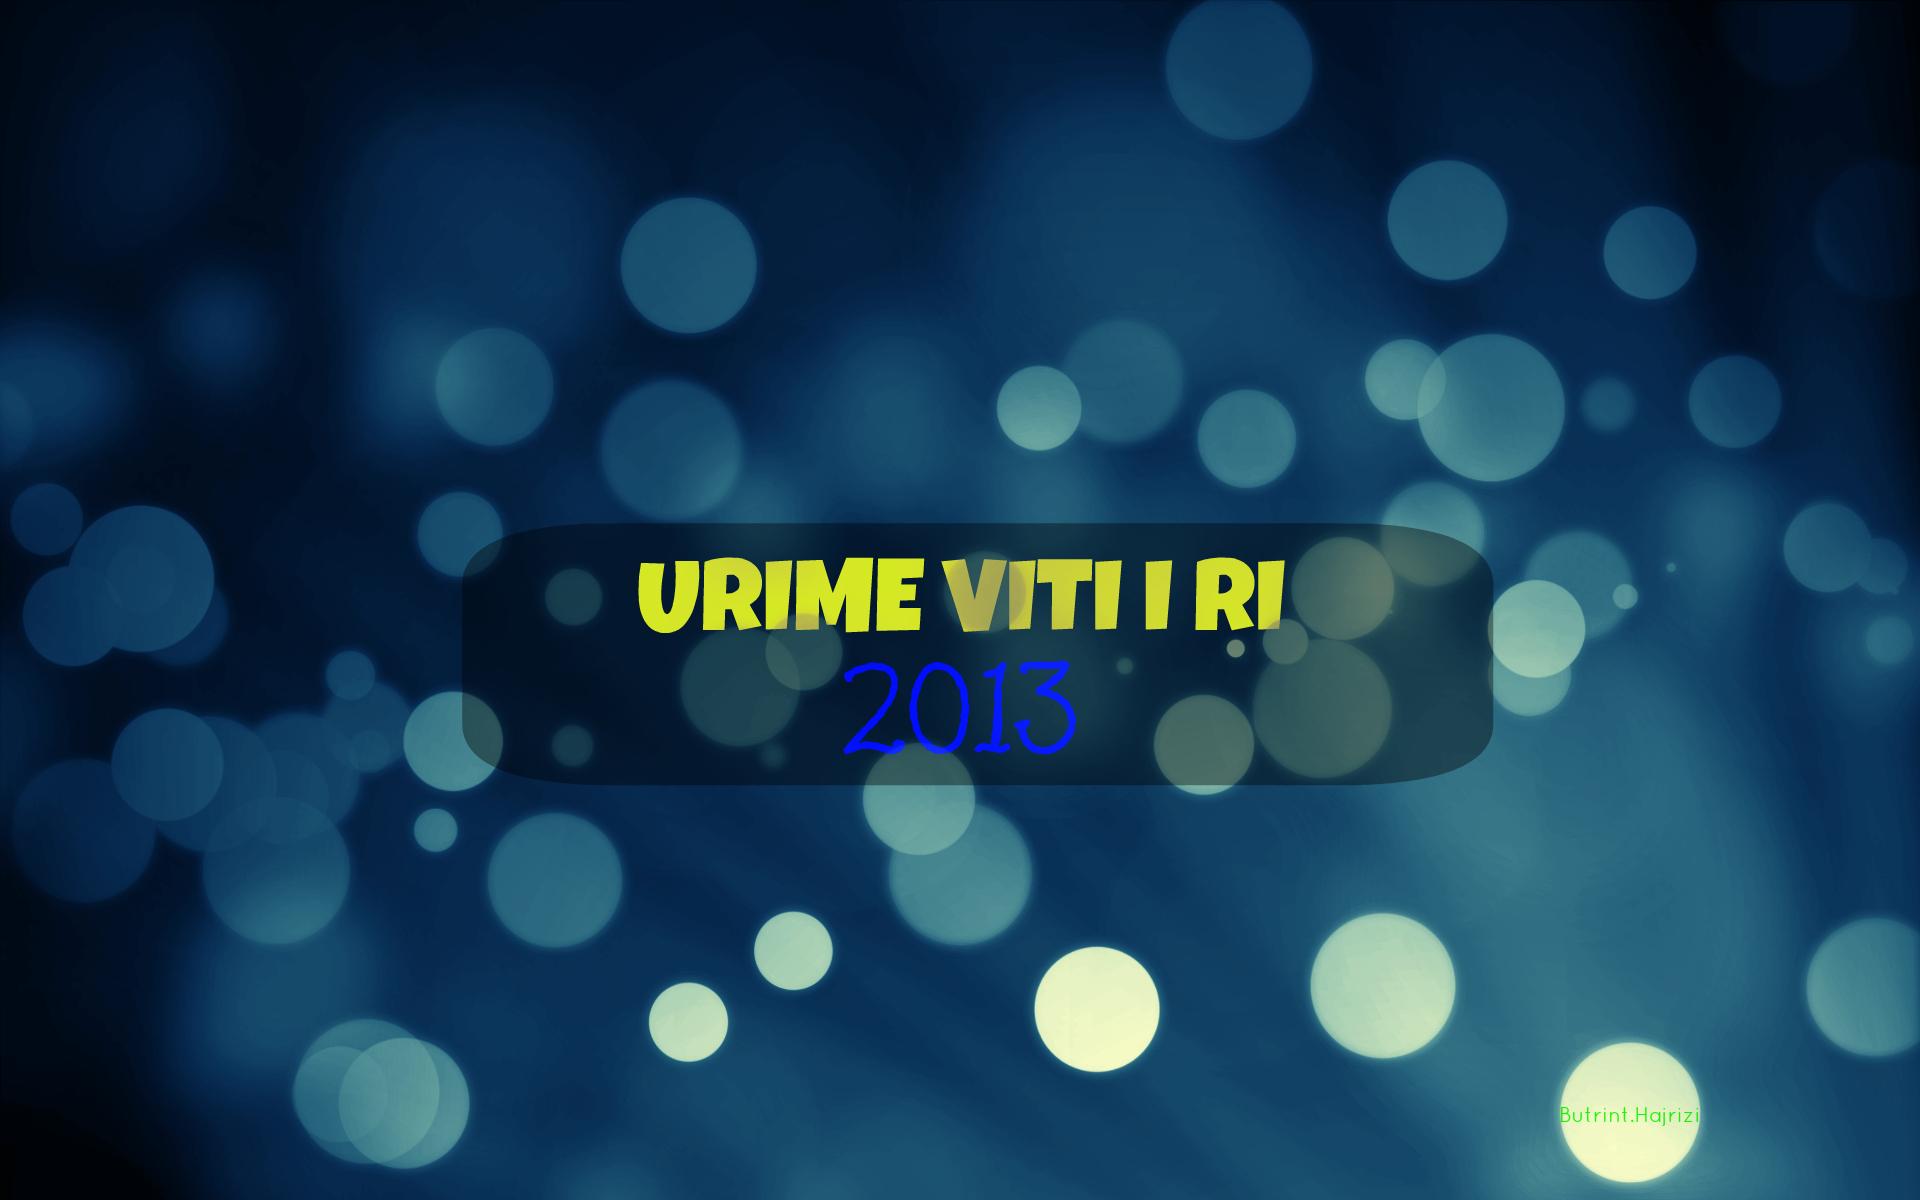 Urime viti i ri 2013 - Happy New Year 2013 by ButrintHajrizi on ...